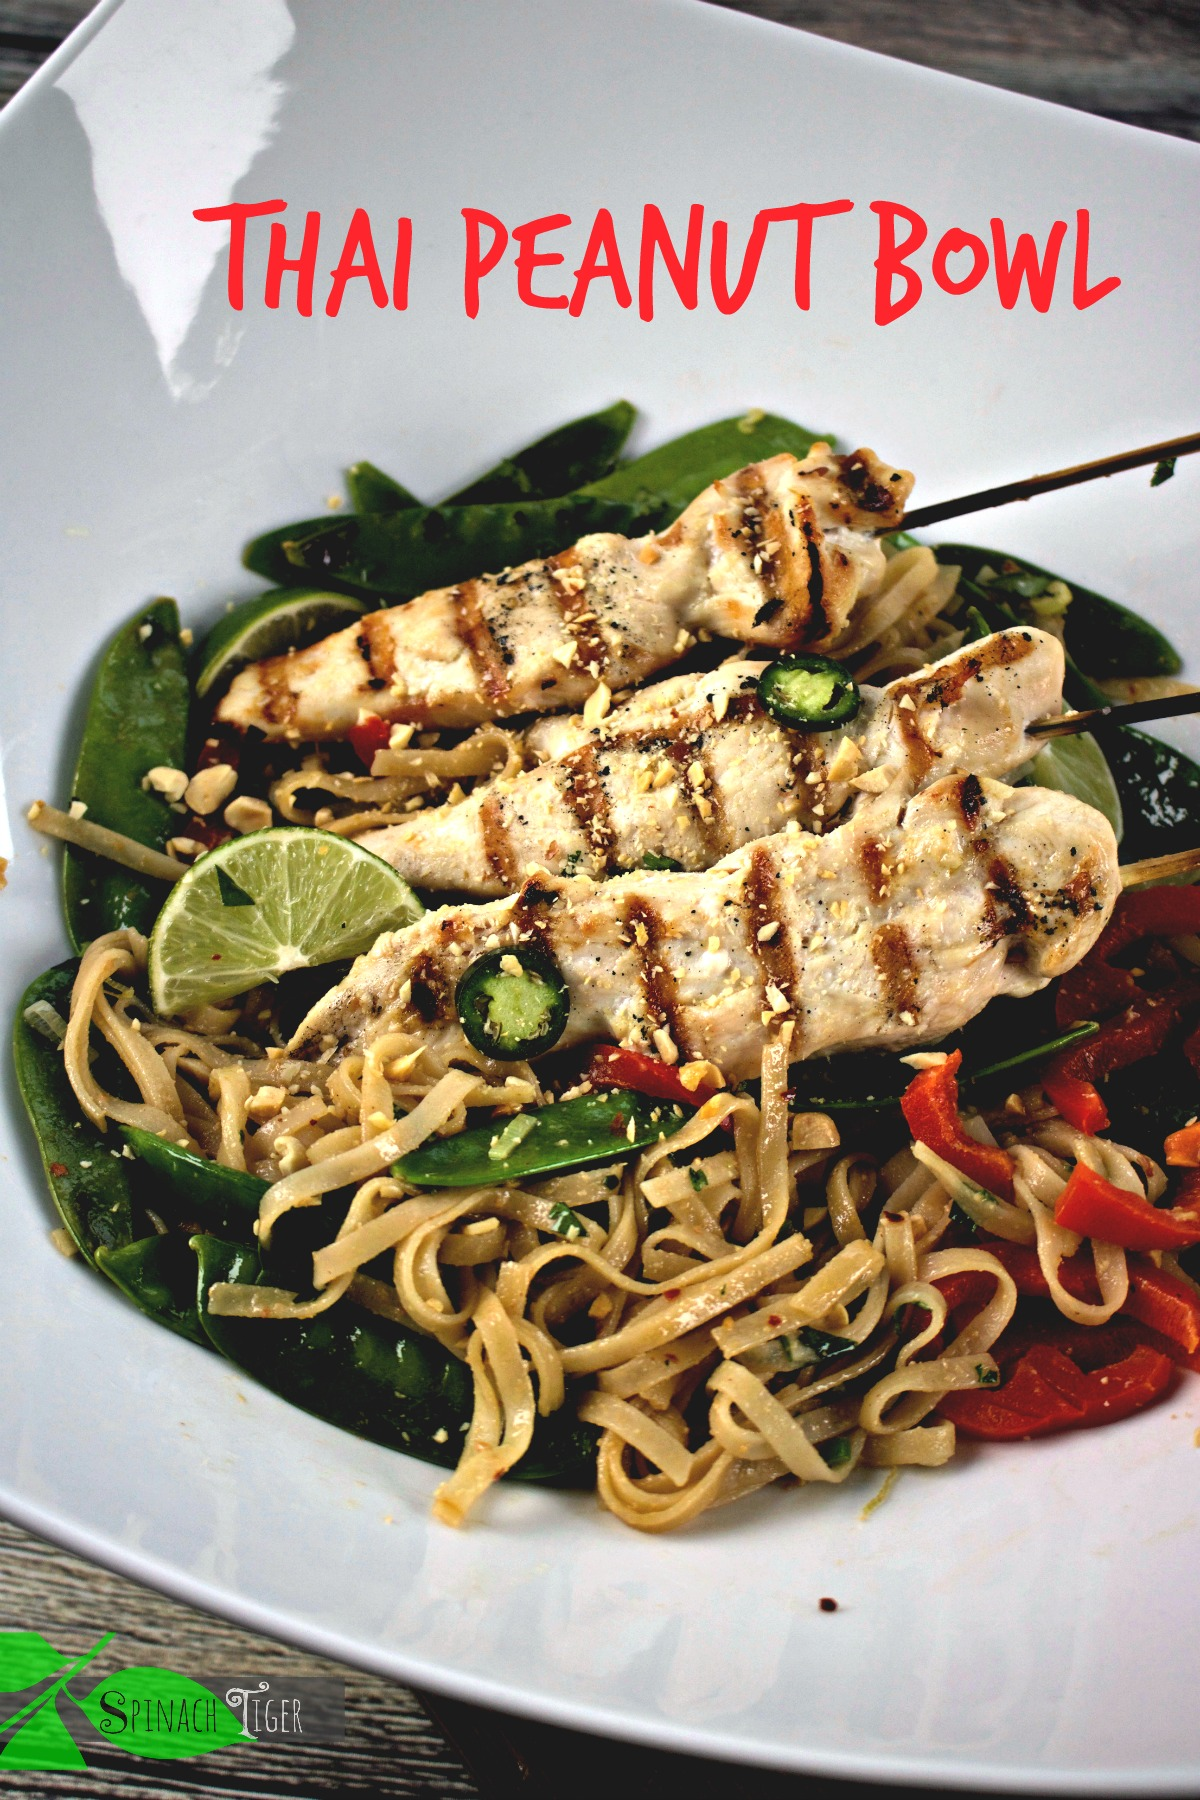 Thai Peanut Bowl, Healthy Chicken Pasta Recipes from Spinach Tiger